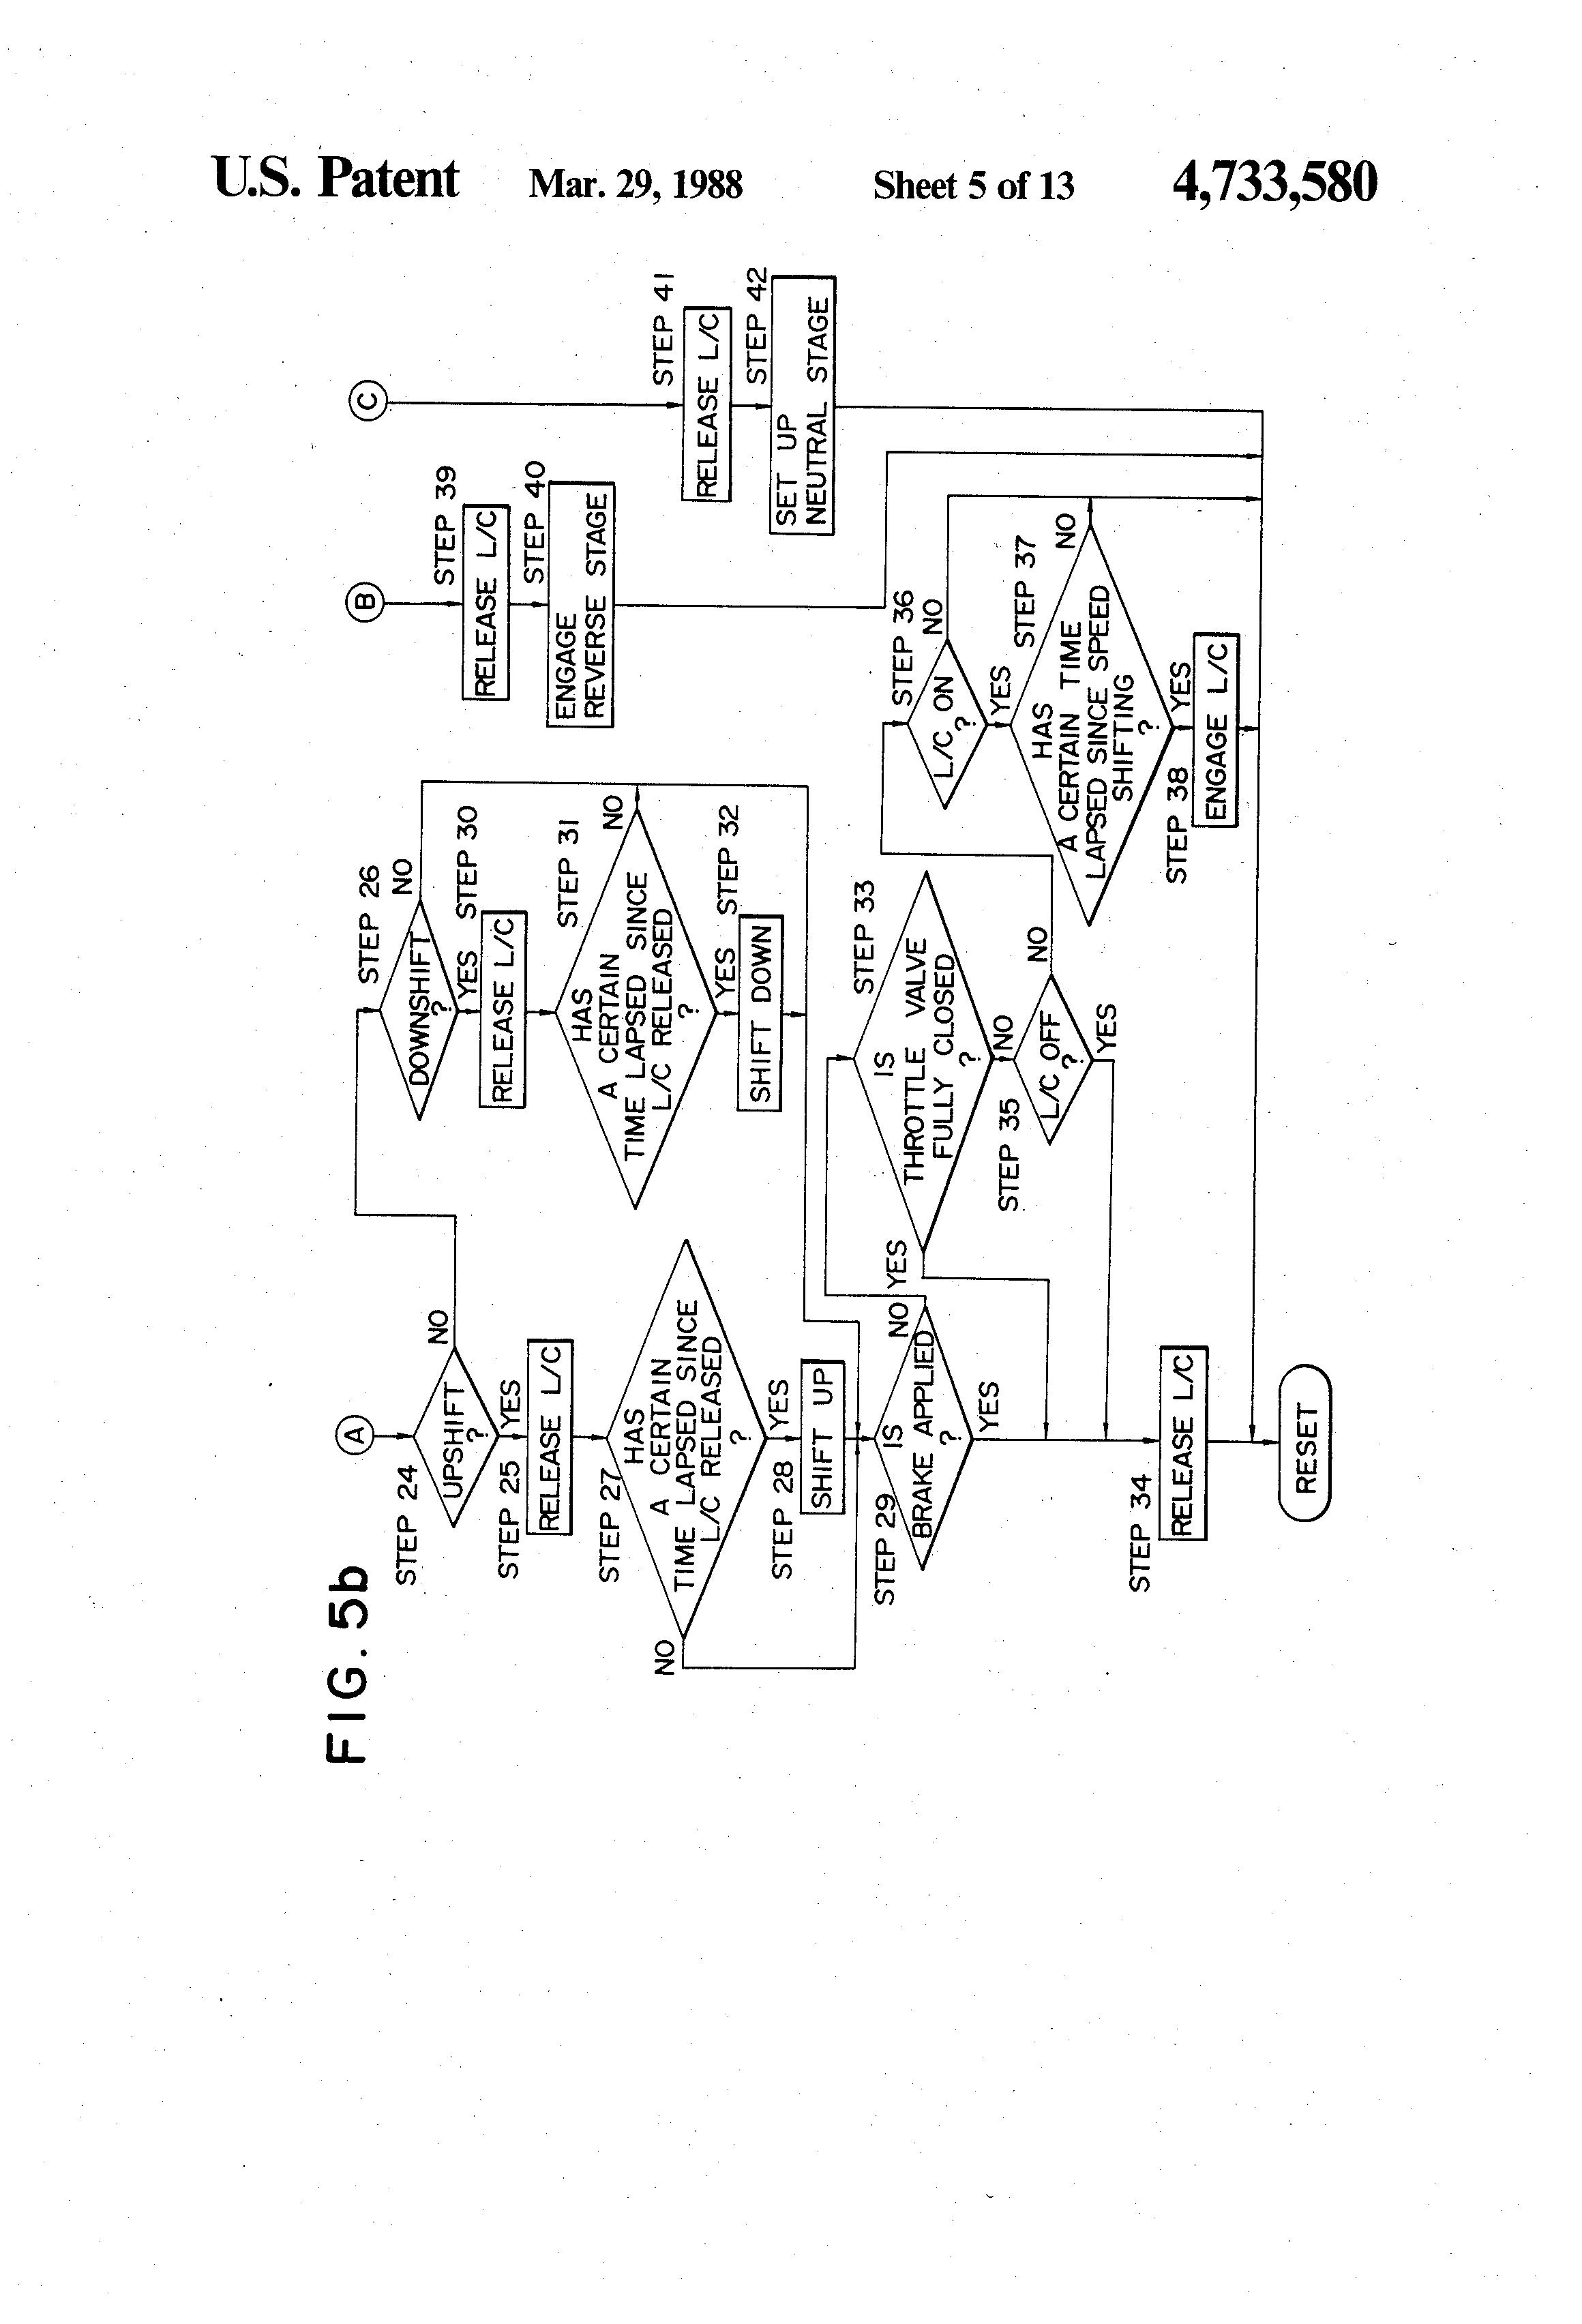 Mode of transmission-8936